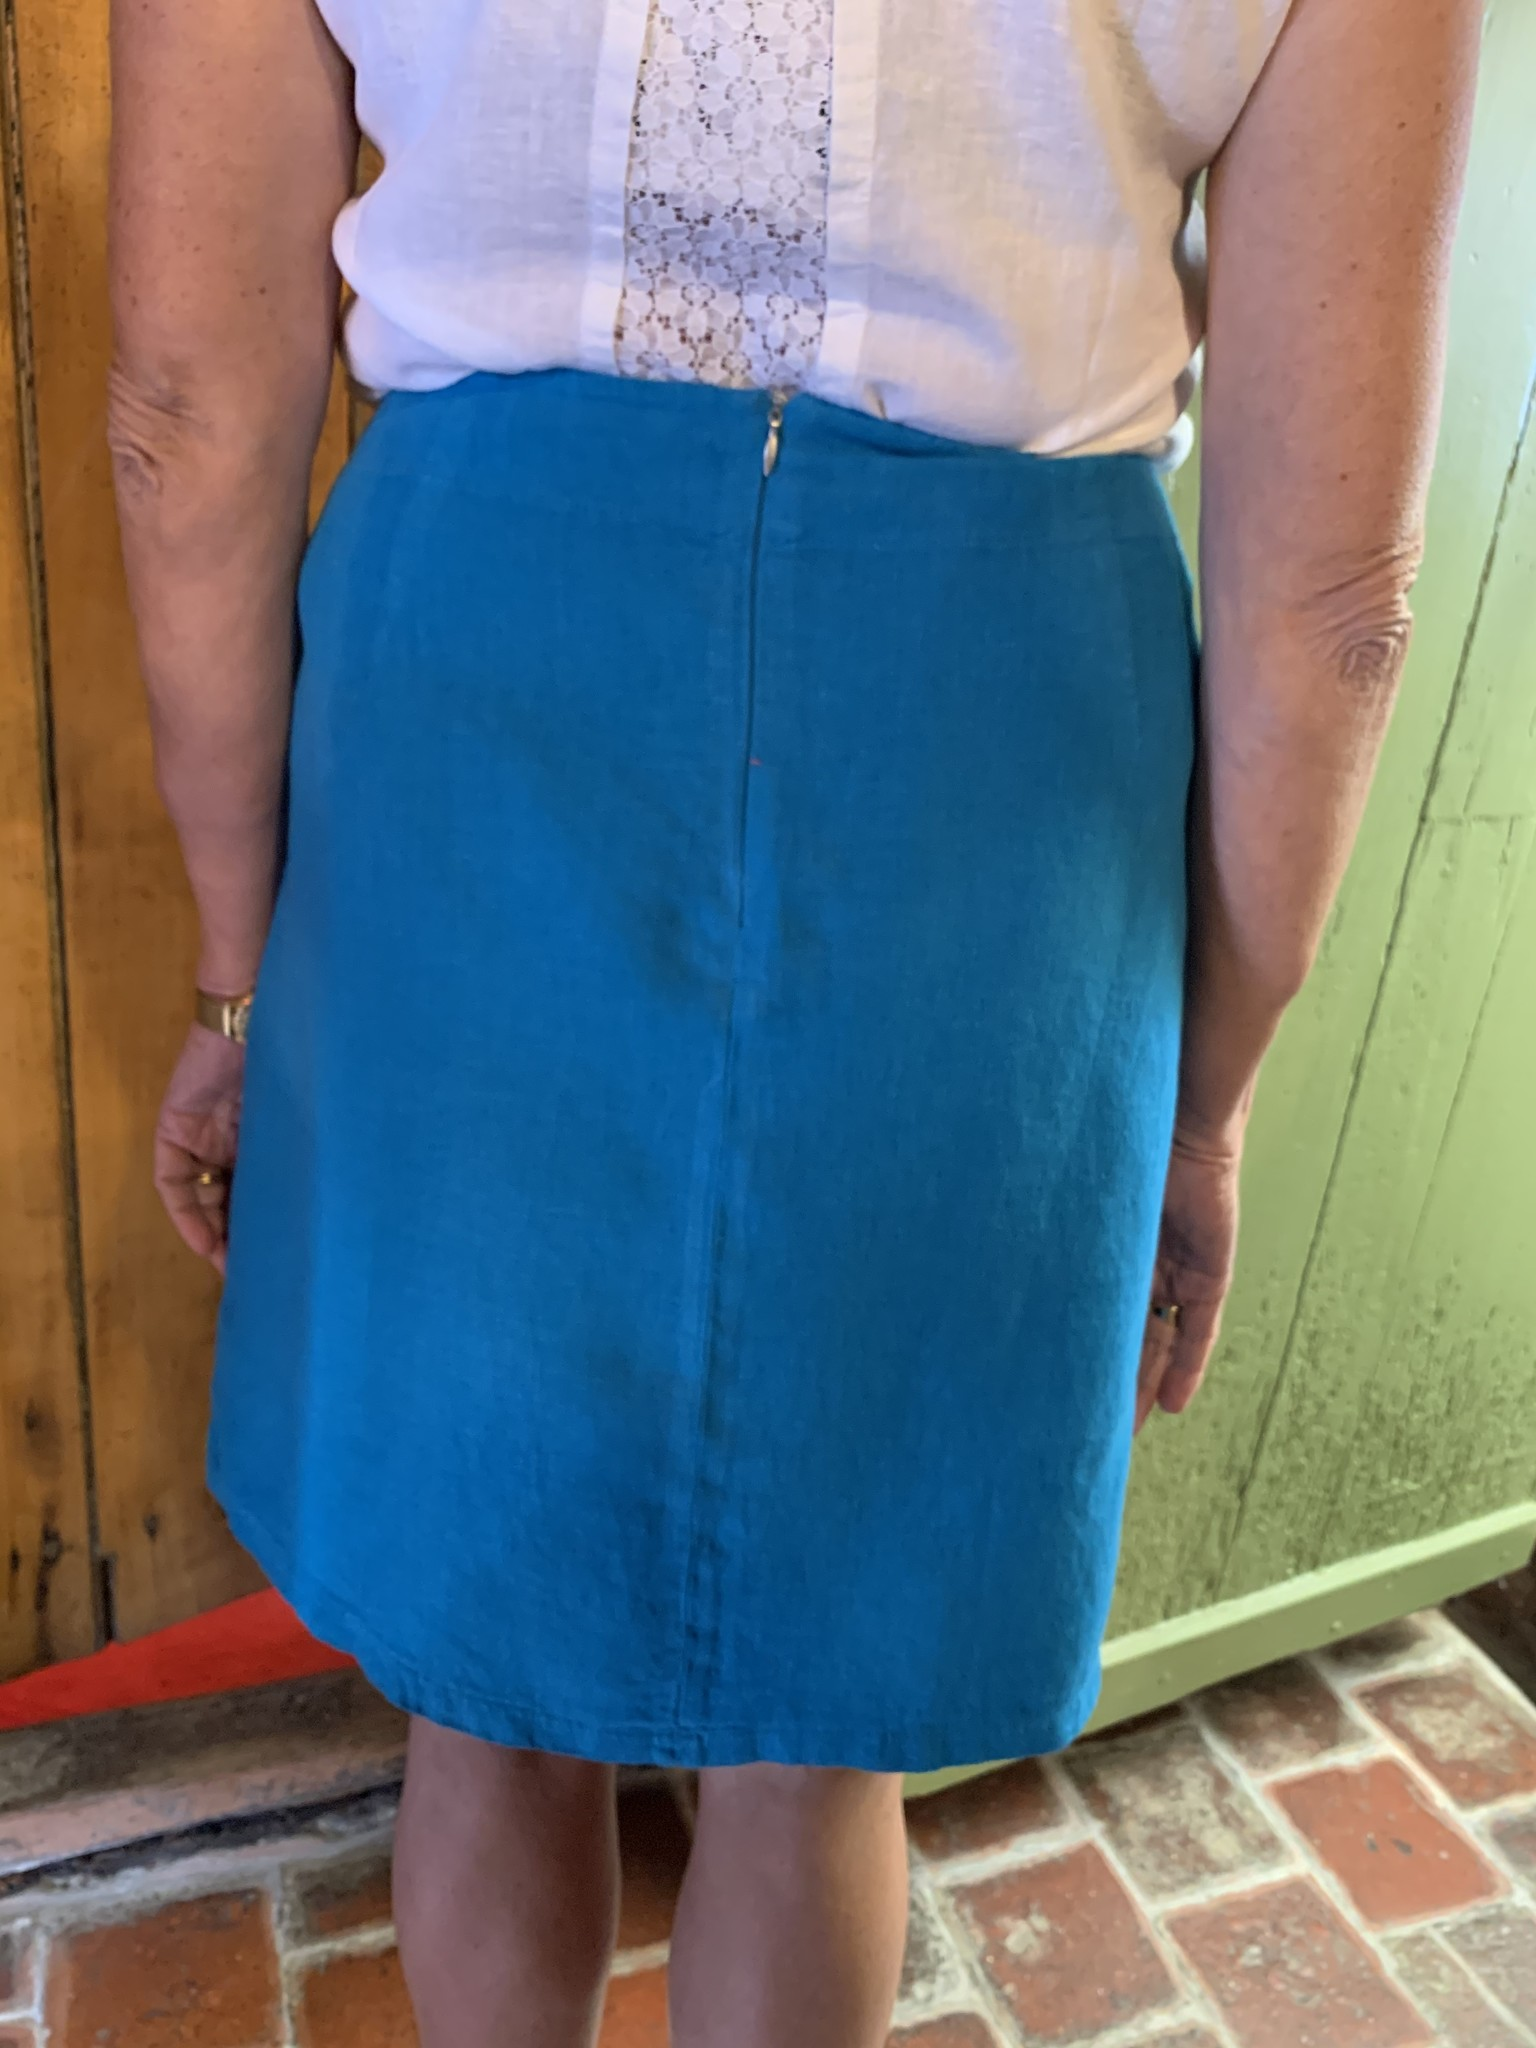 Maloka Jupe jovial bleu celeste